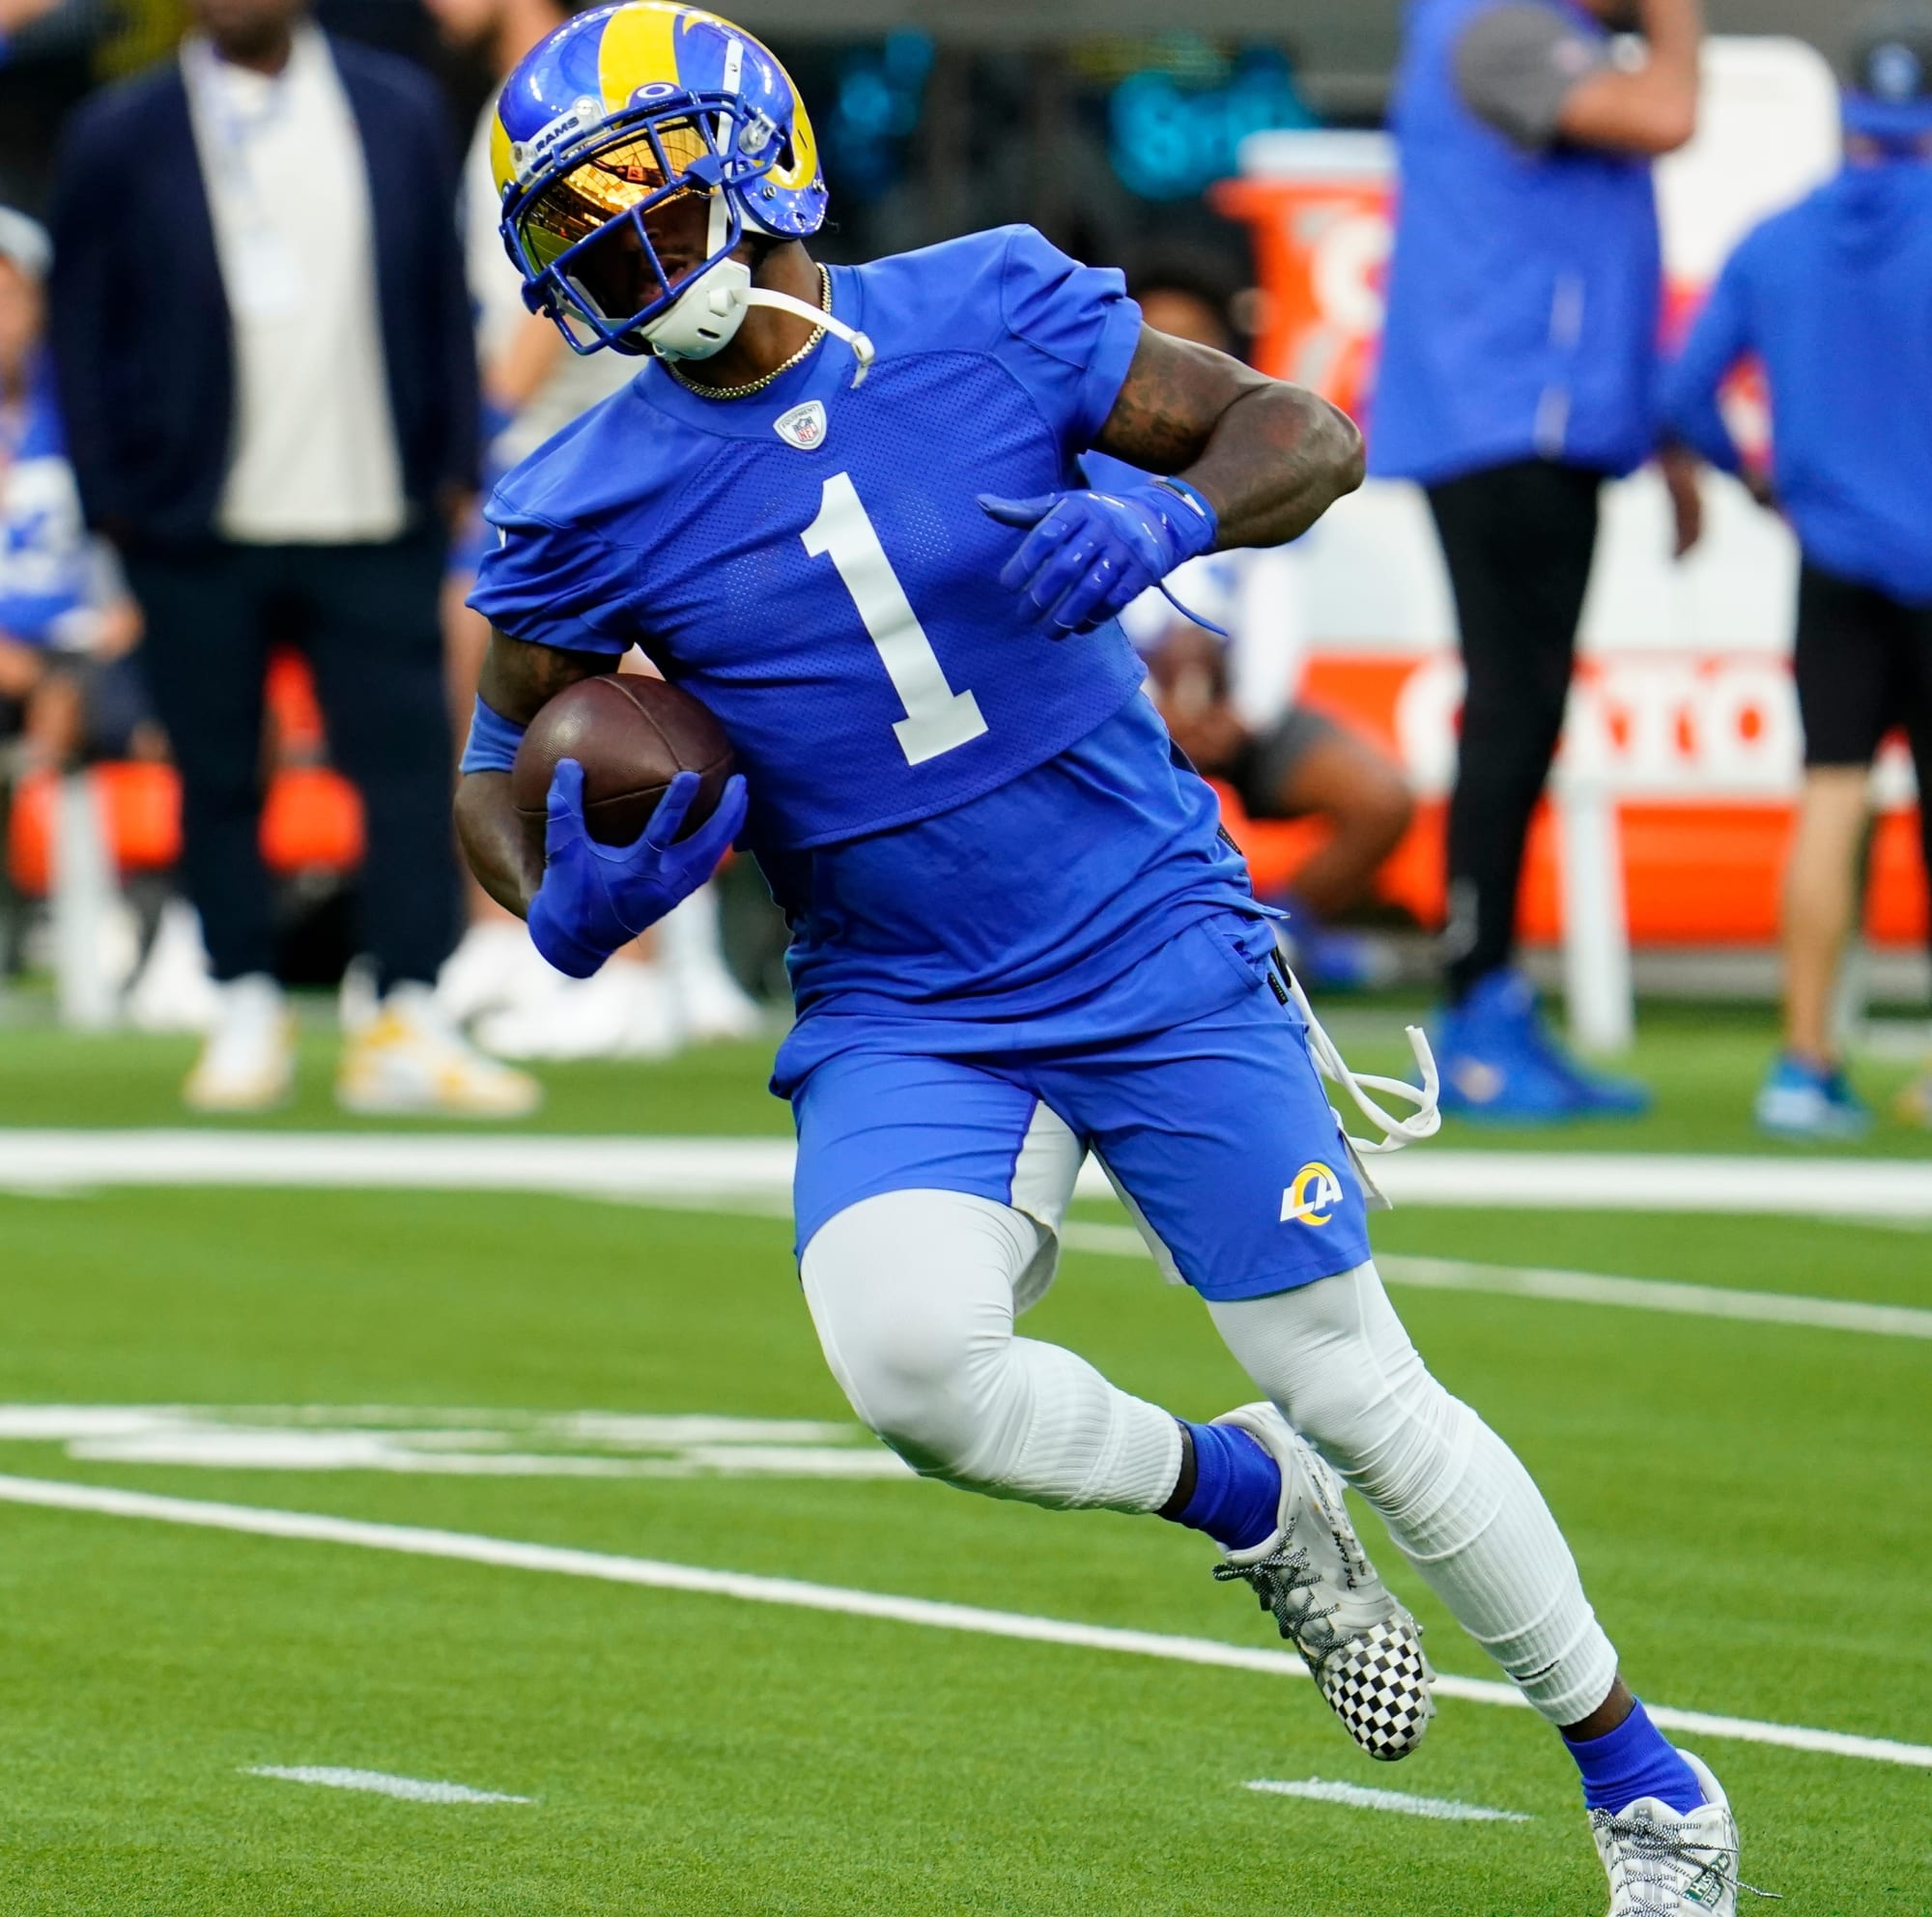 LA Rams: DeSean Jackson sees a special offense emerging in 2021